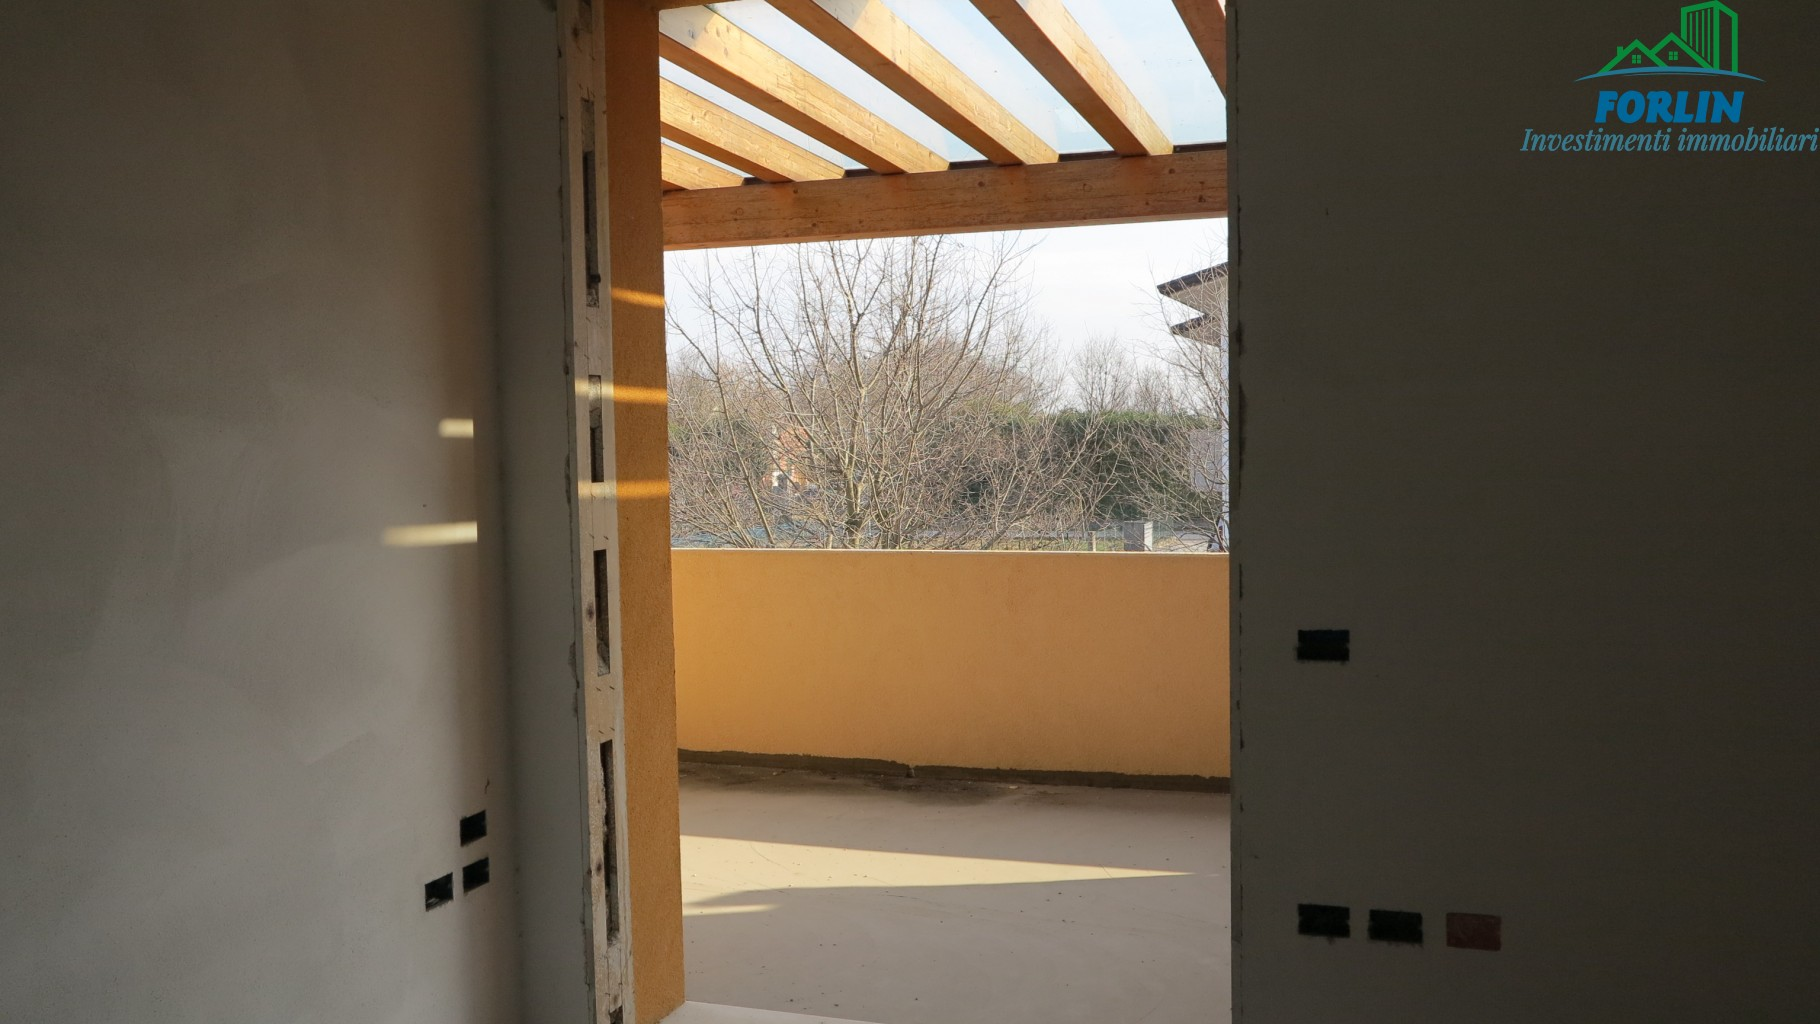 Grande bifamiliare con garage al piano terra v259 forlin for Garage con al piano di sopra